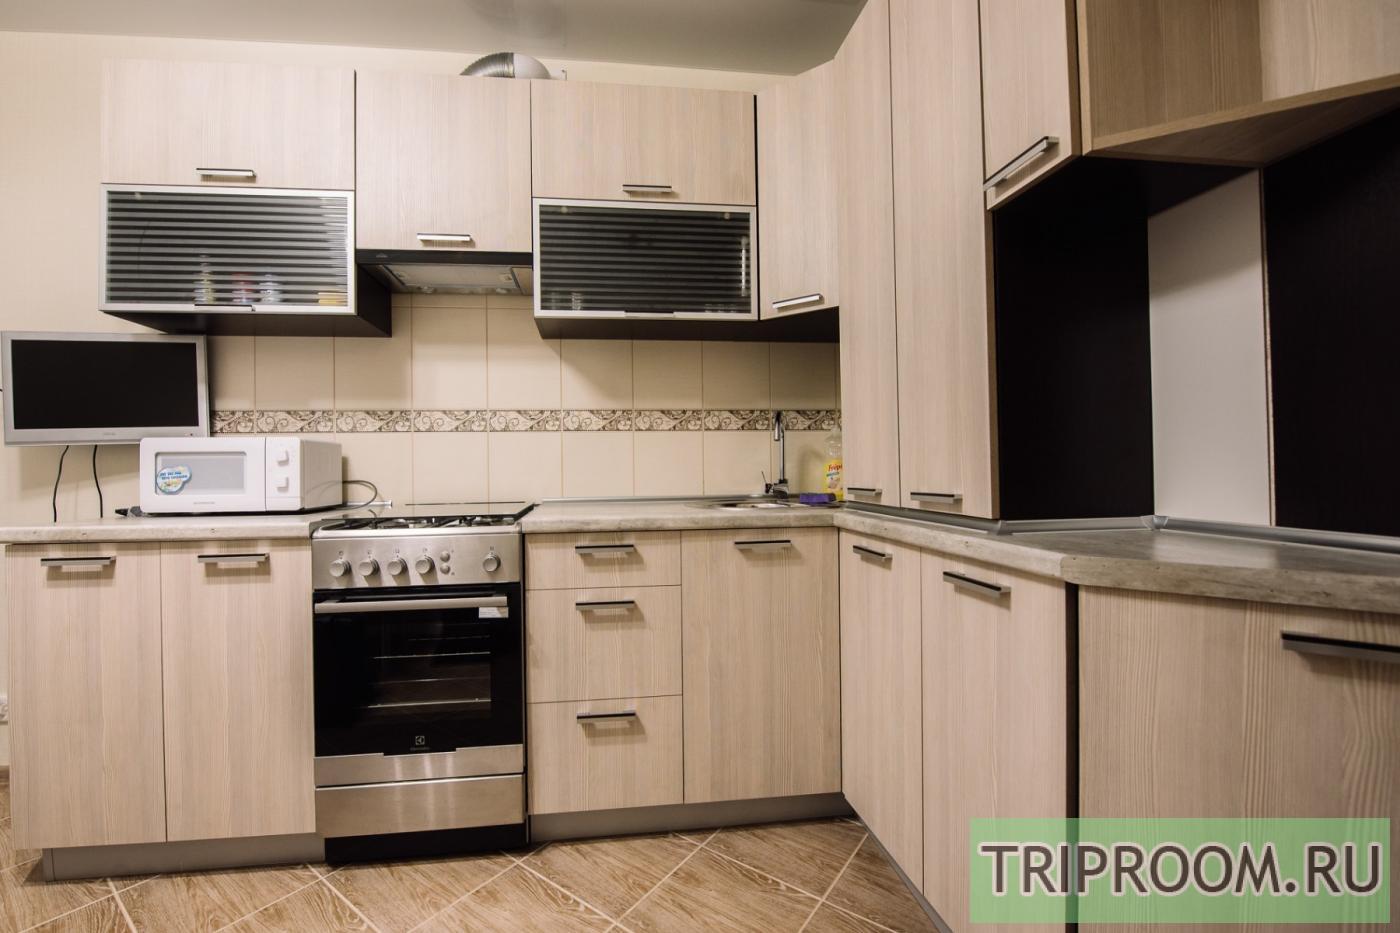 1-комнатная квартира посуточно (вариант № 21616), ул. Нормандия-Неман, фото № 8